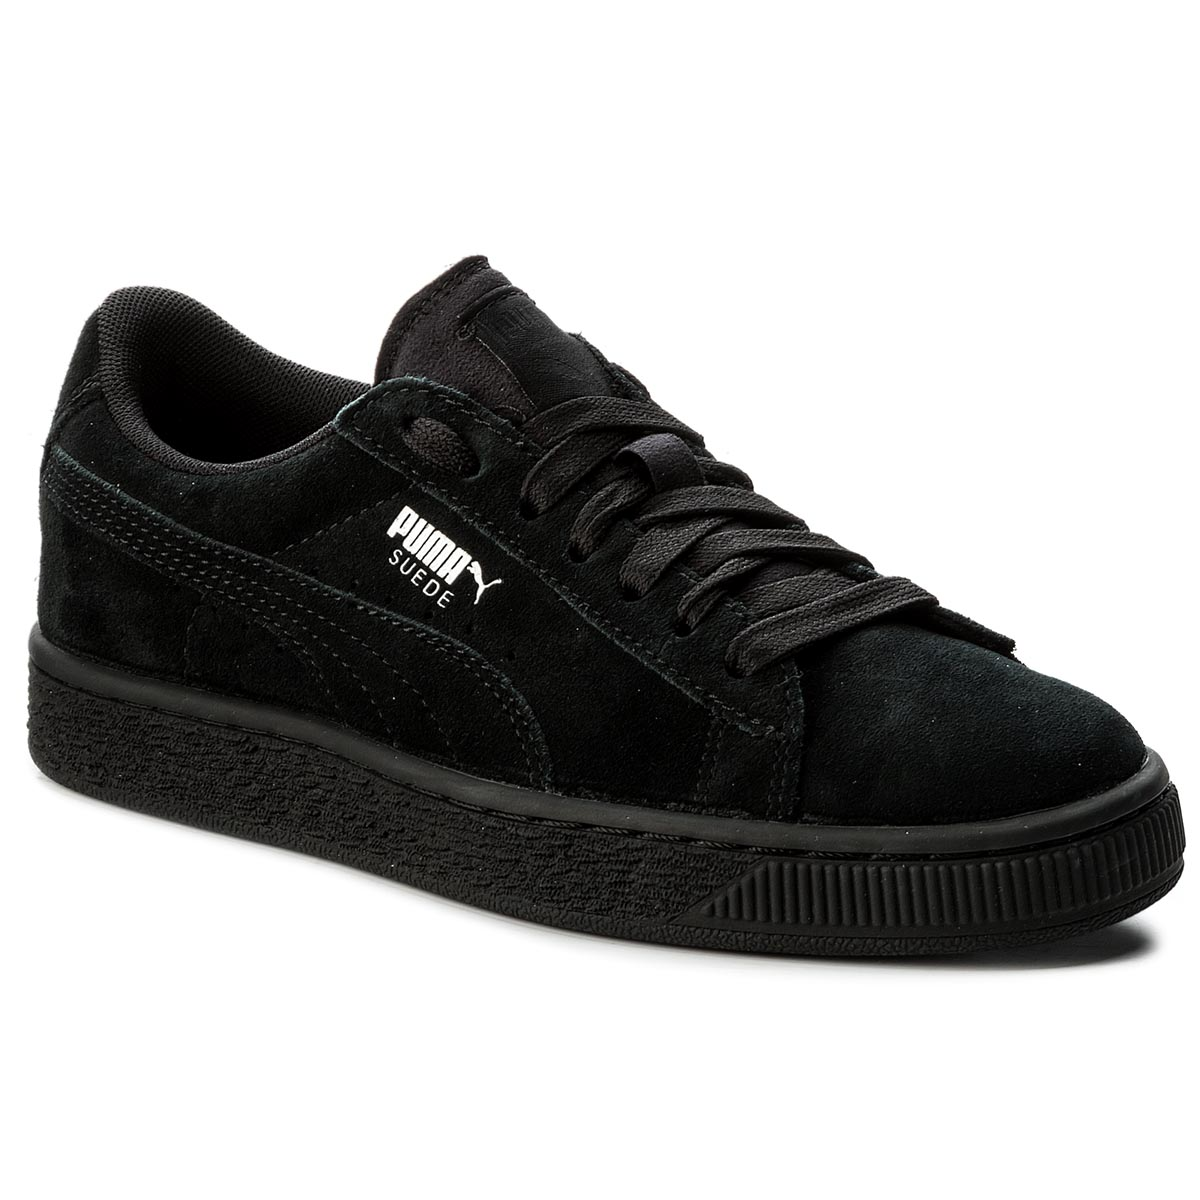 Sneakers PUMA Suede Heart Satin Wn's 362714 03 Puma BlackPuma Black